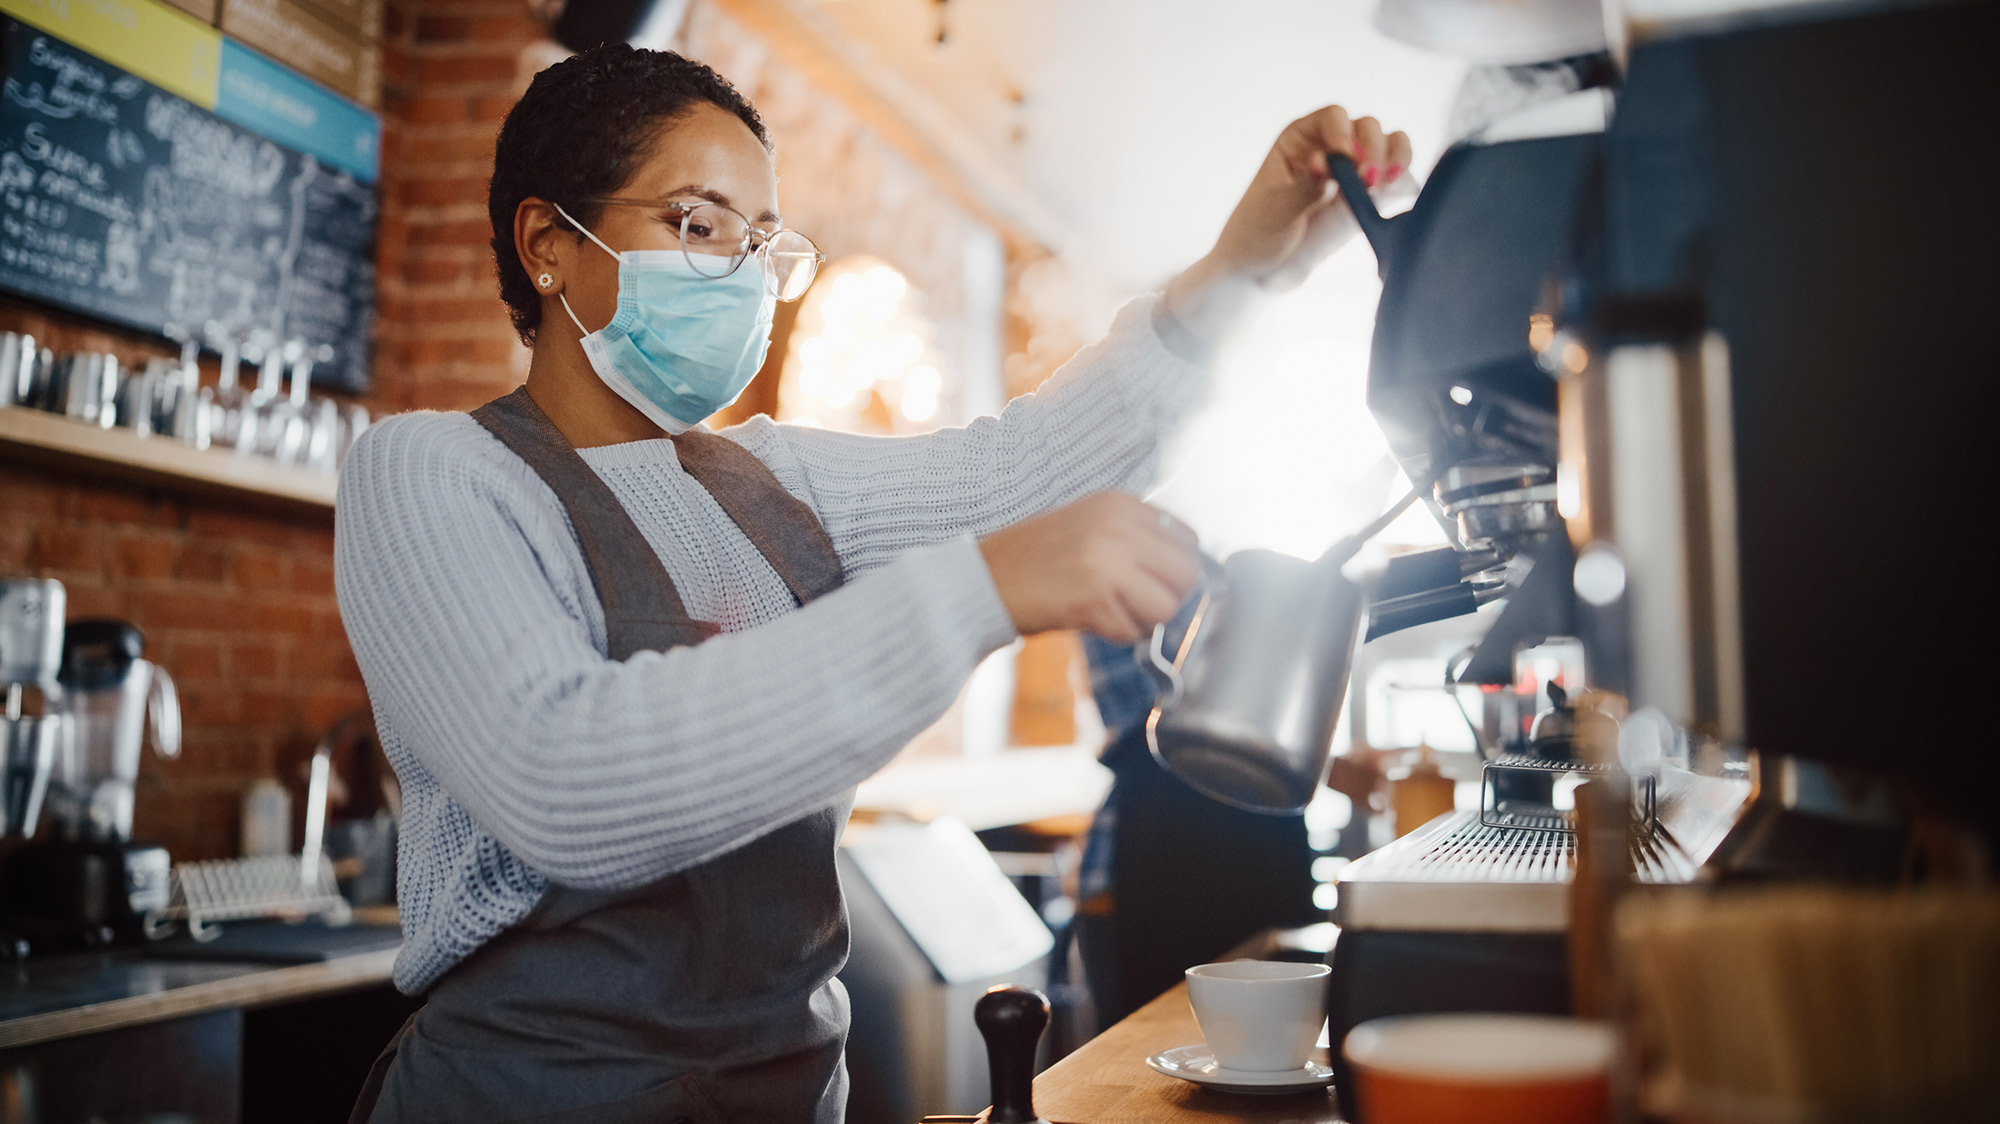 Barista wearing mask making latte in coffee shop